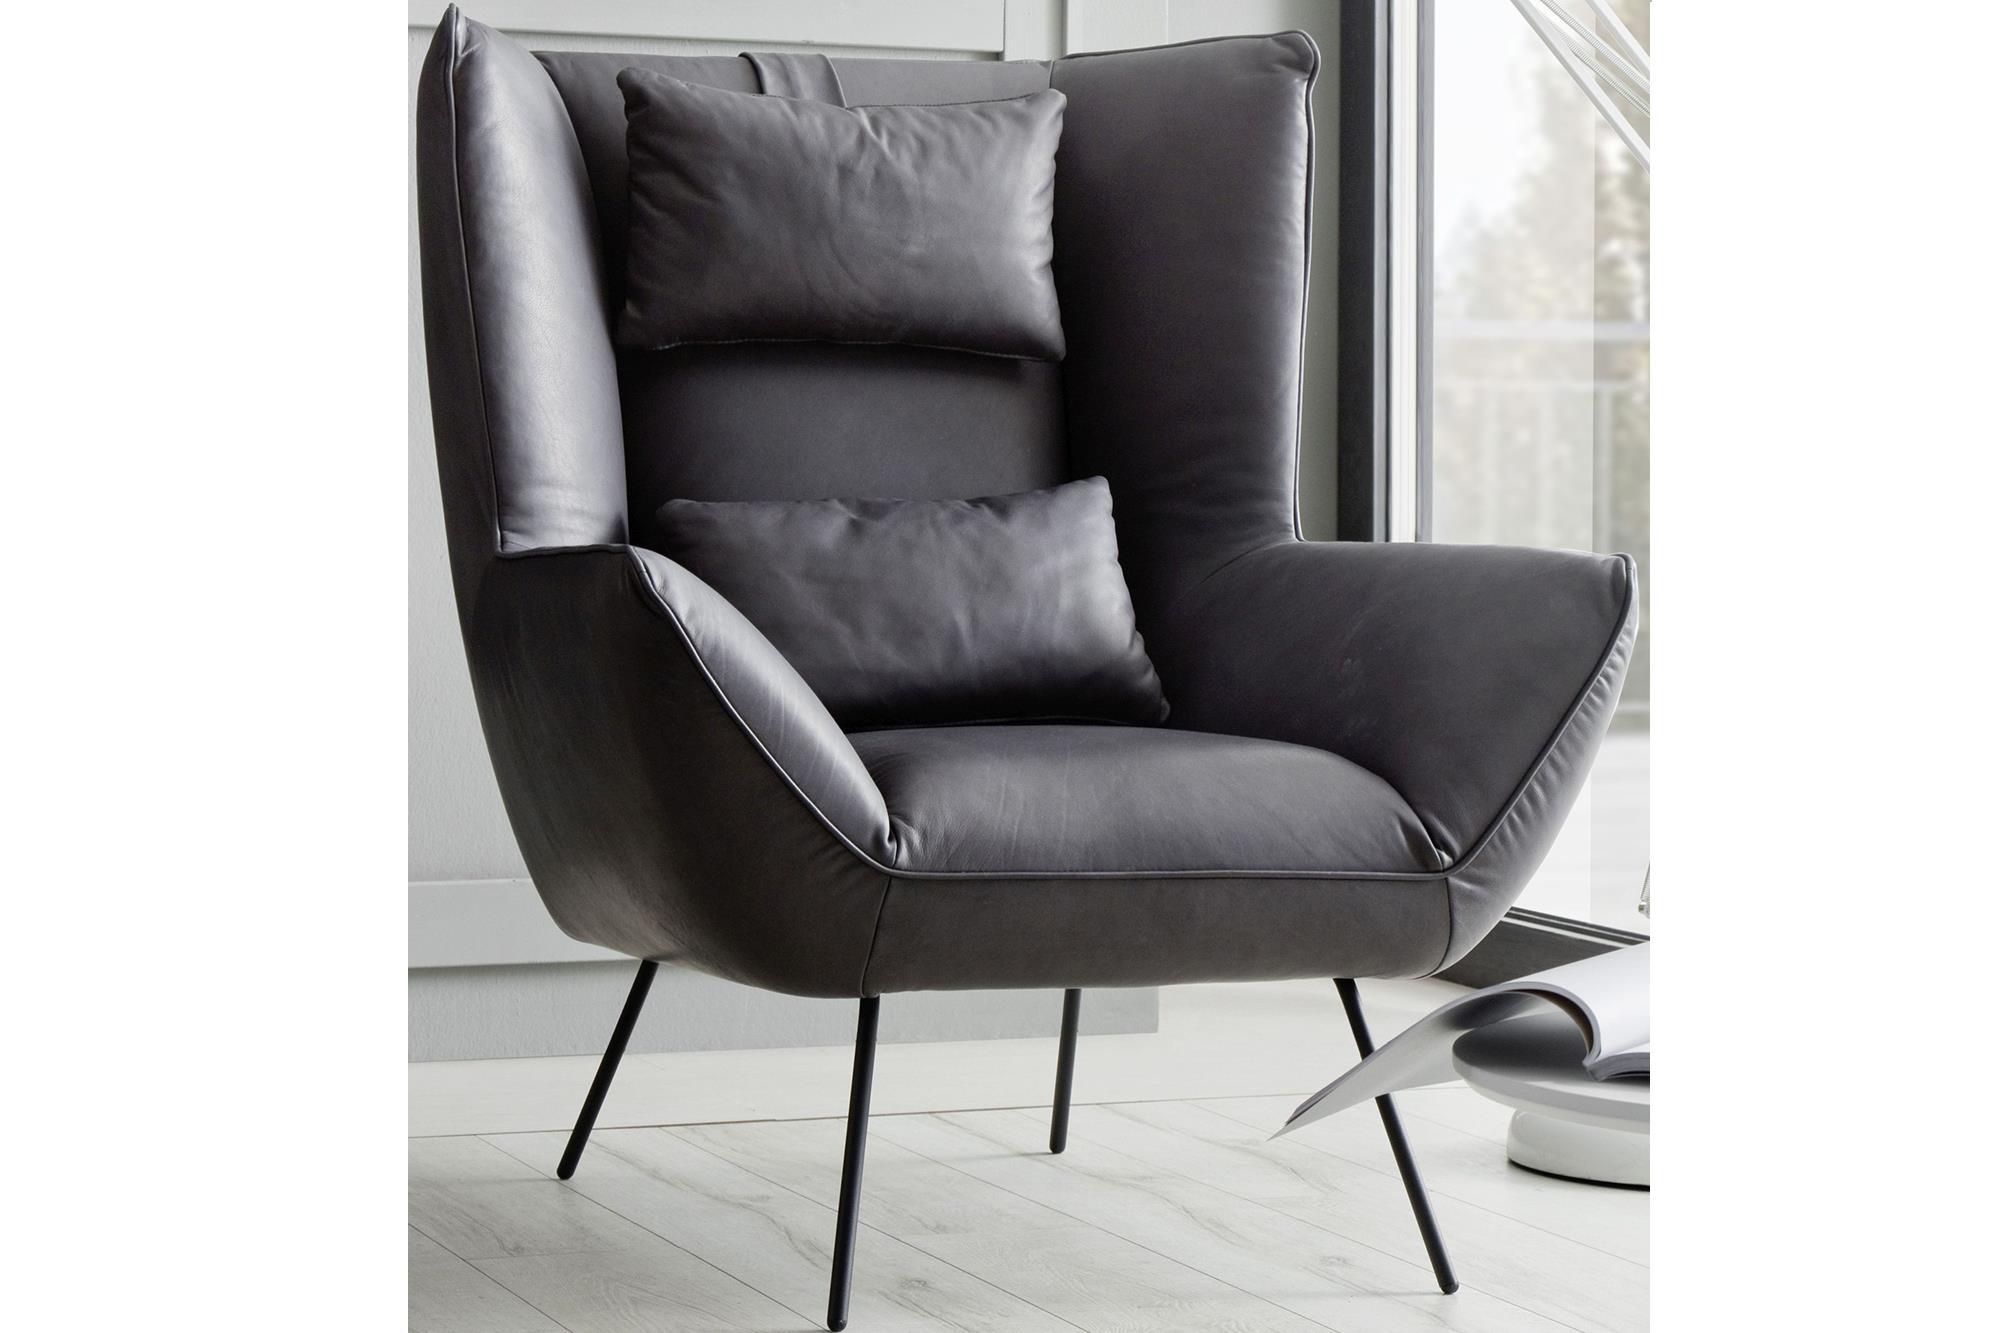 nackenkissen f r sessel wellpur ergo sensitiv. Black Bedroom Furniture Sets. Home Design Ideas